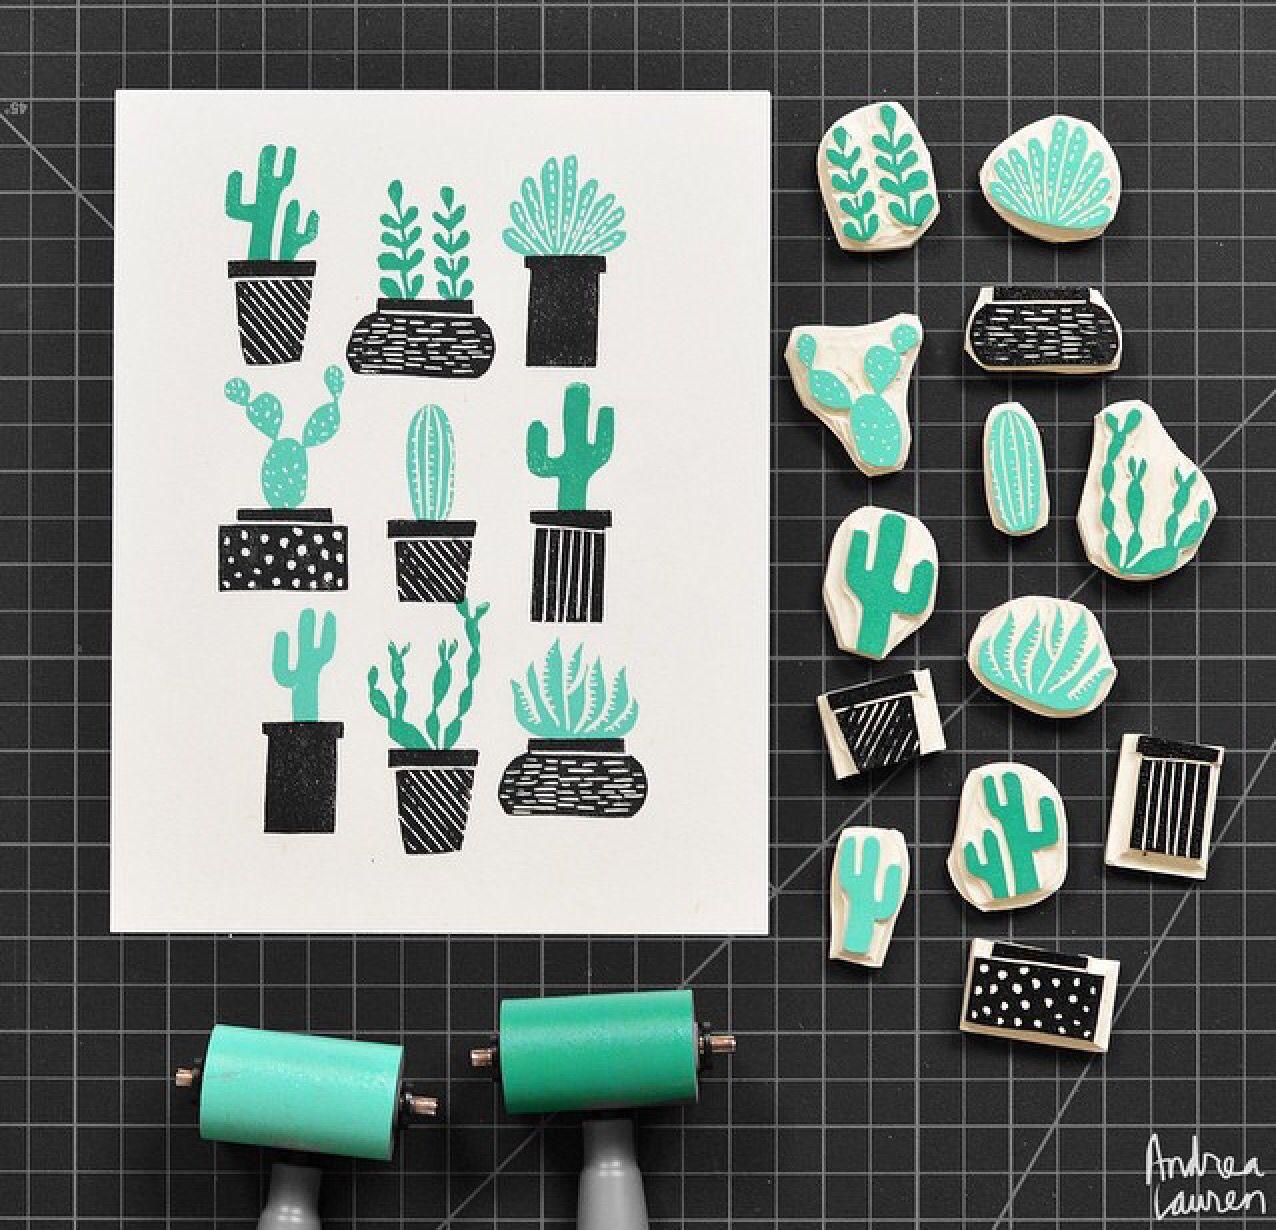 rubberstamp via instagram inkprintrepeat rubber stamps ideas pinterest drucken. Black Bedroom Furniture Sets. Home Design Ideas